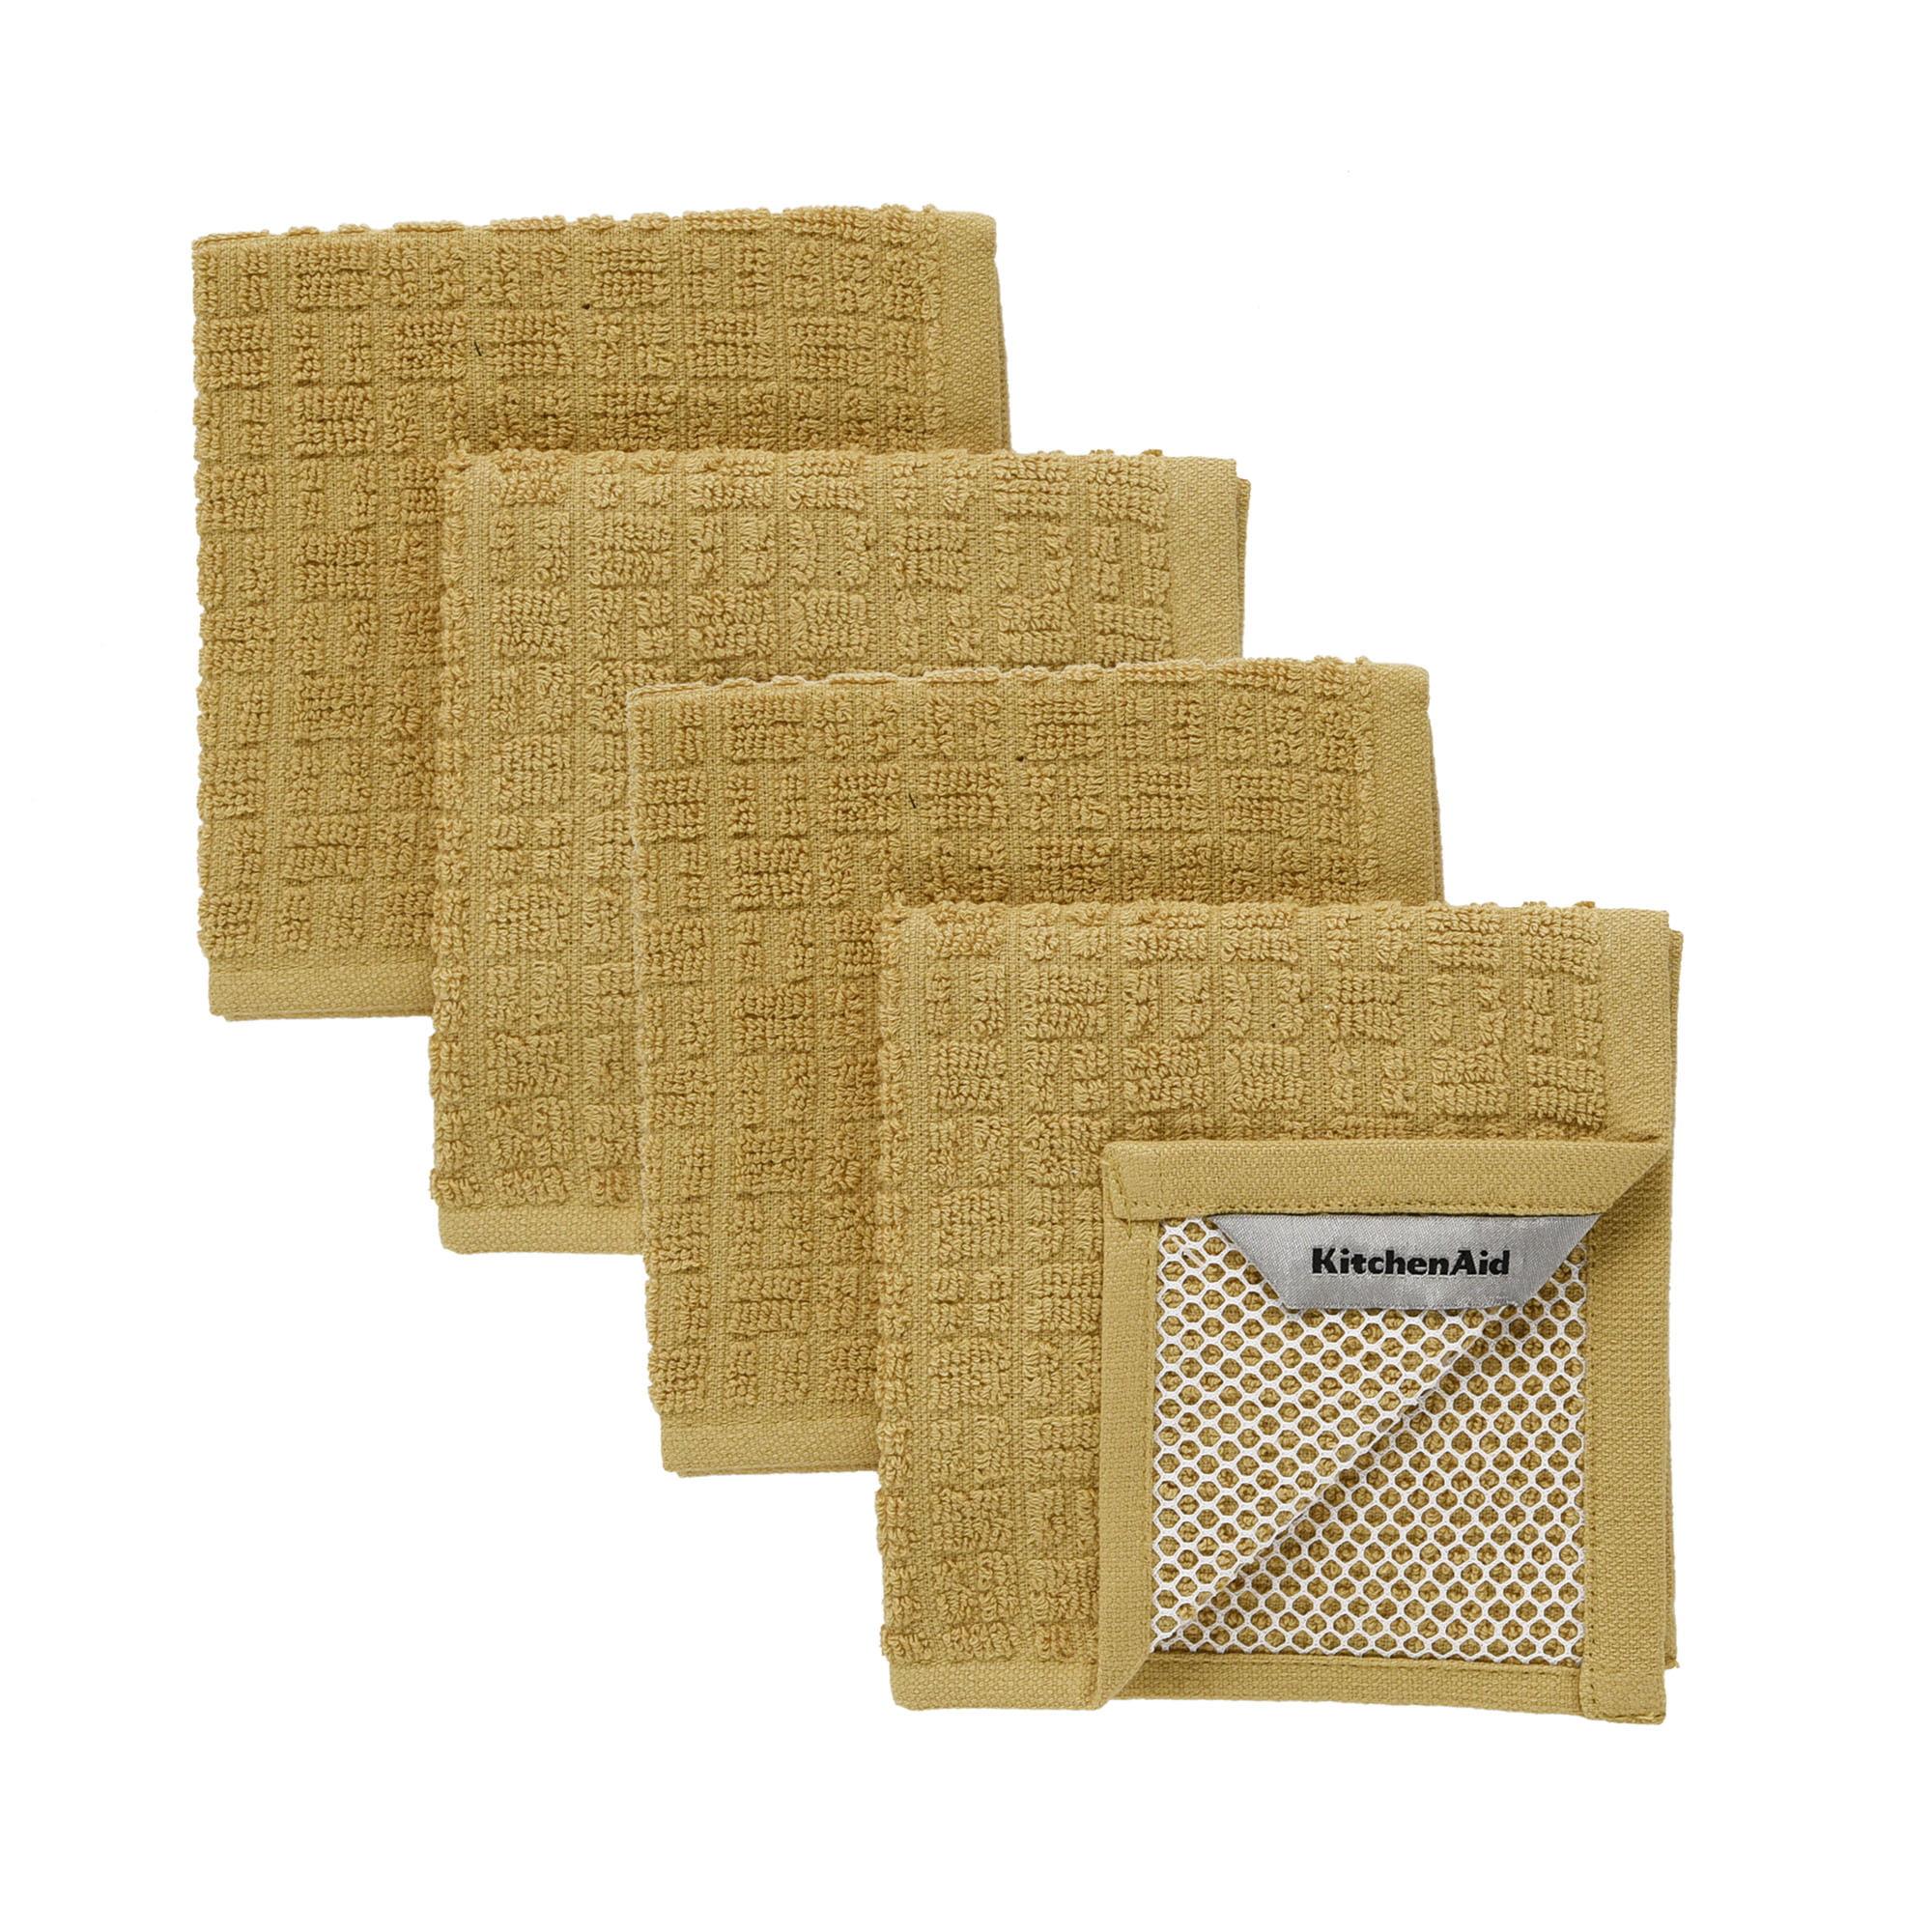 Kitchenaid Astral Scrubber Dishcloths, Wood, Set of 4